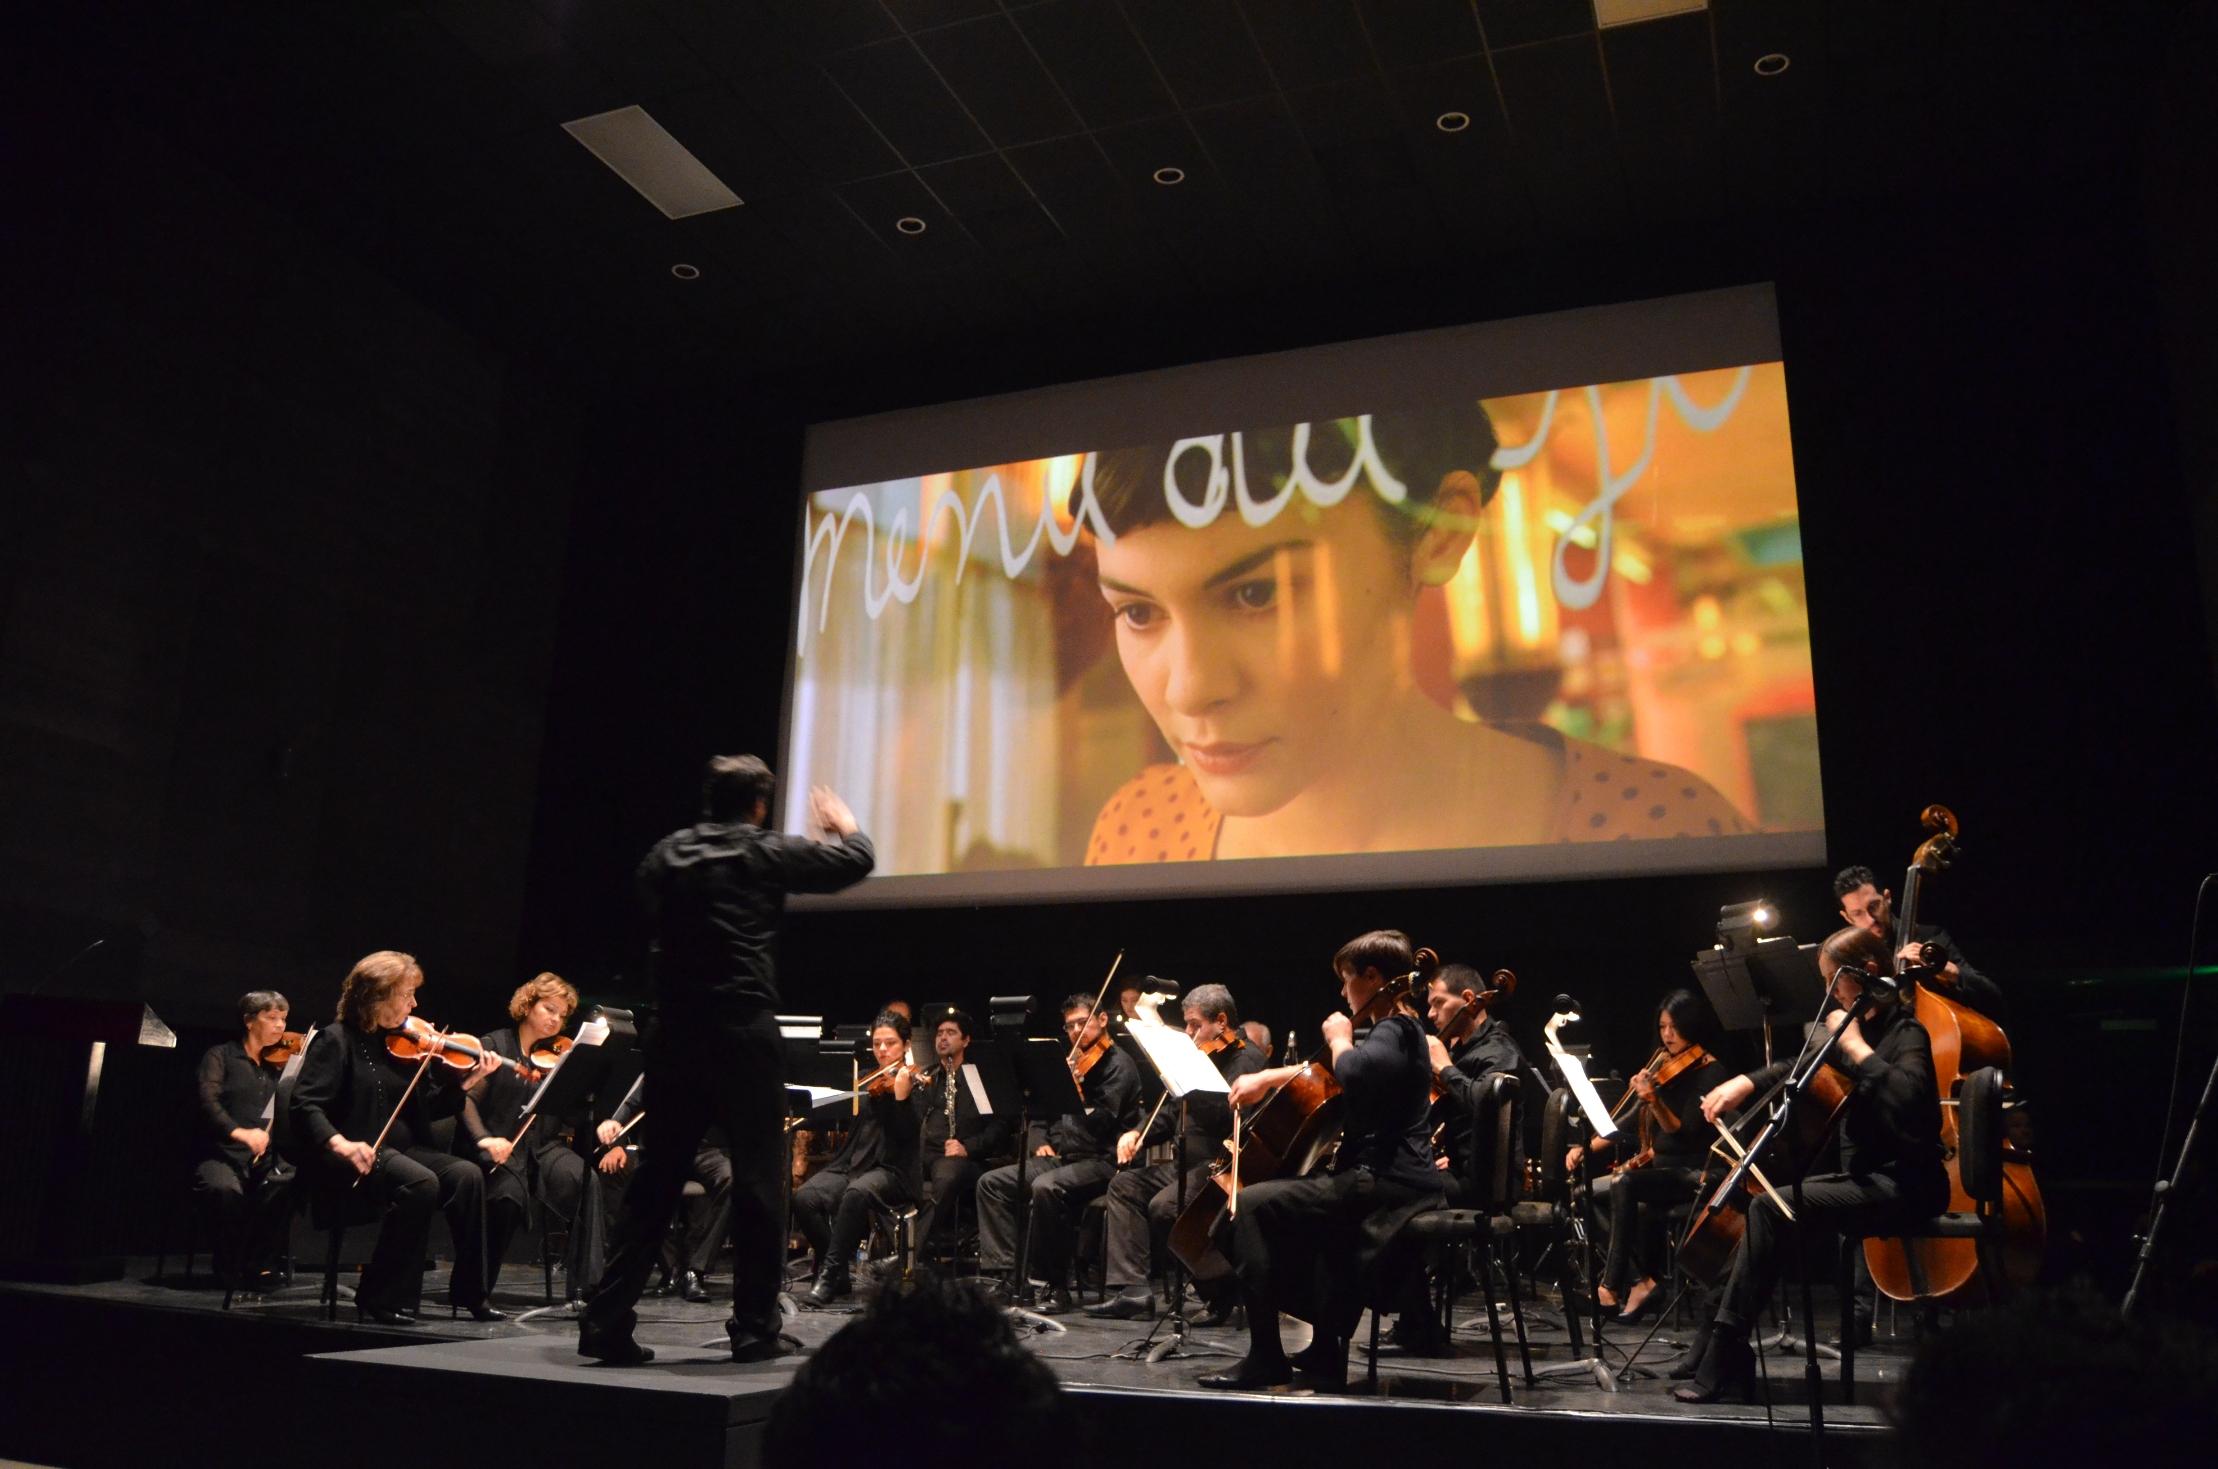 Celebró el CECUT el V Aniversario de la Cineteca Tijuana